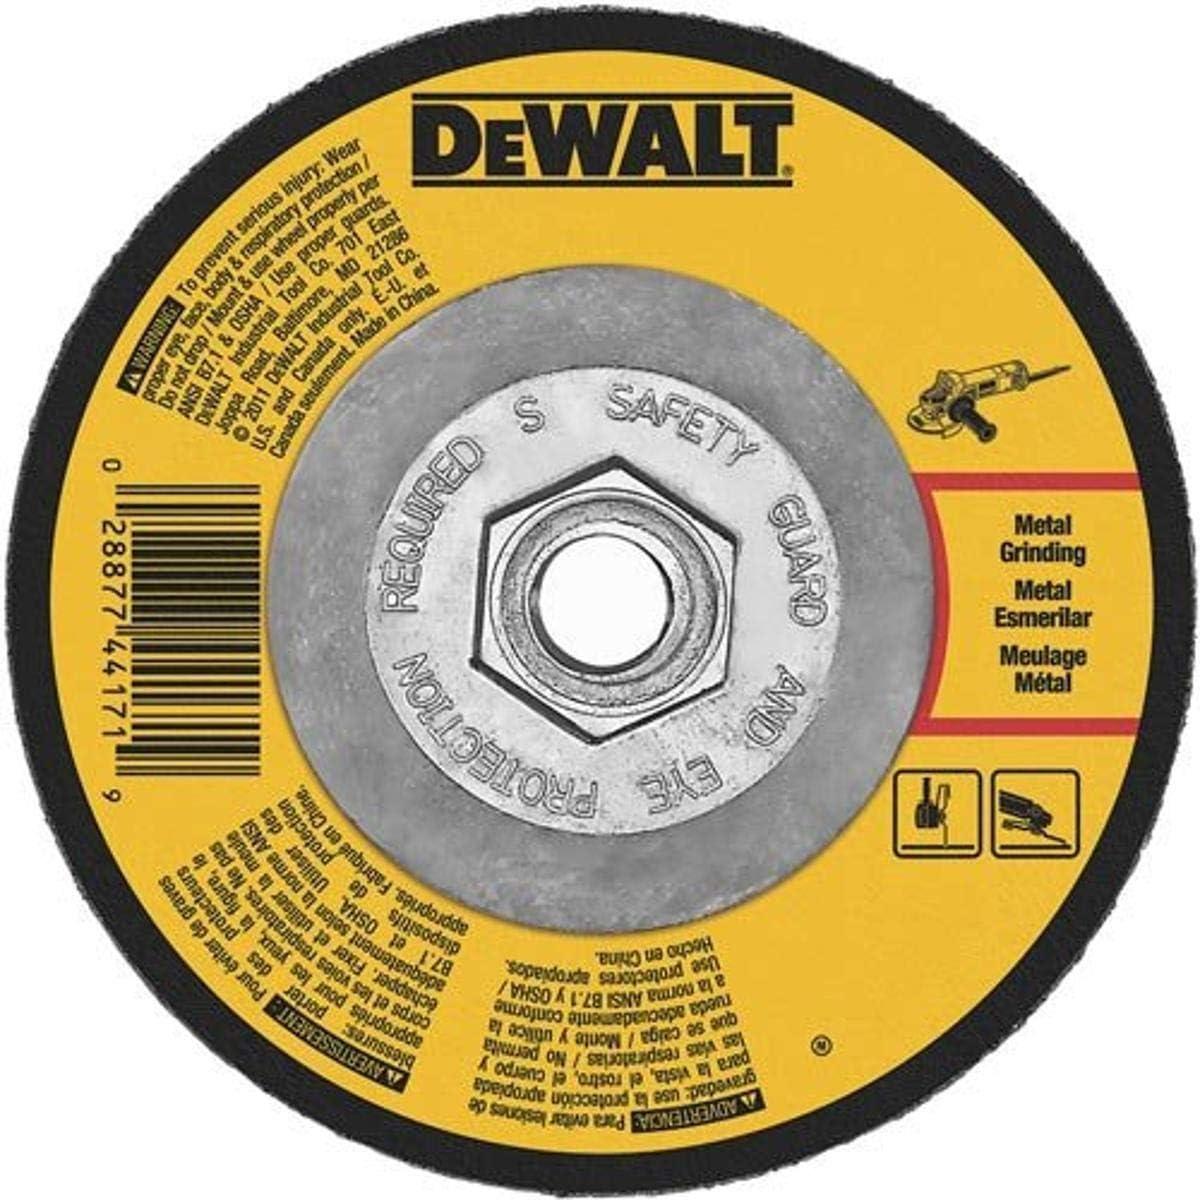 DEWALT DWA4512H Los Angeles Mall 11 Brand Cheap Sale Venue Metal Grinding Wheel x 1 8-Inch 5 8 5-Inch